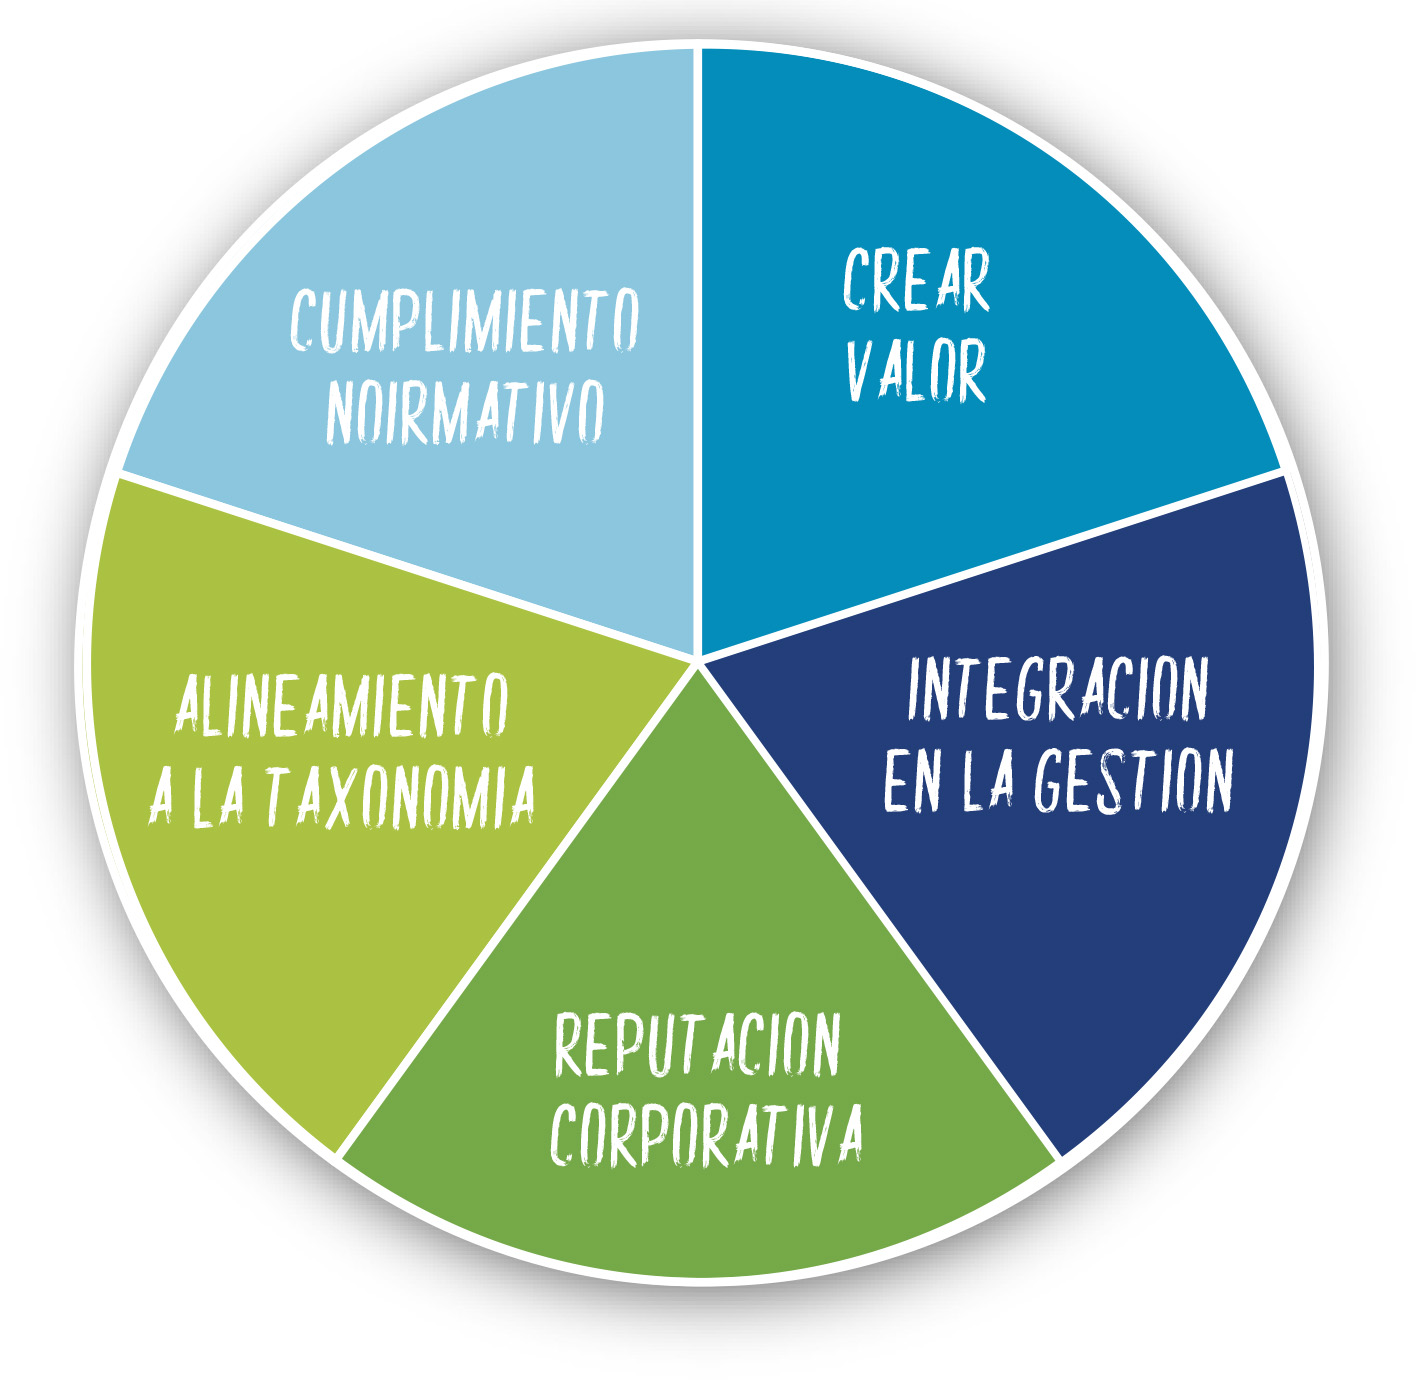 360 sostenibilidad by Omawa.es